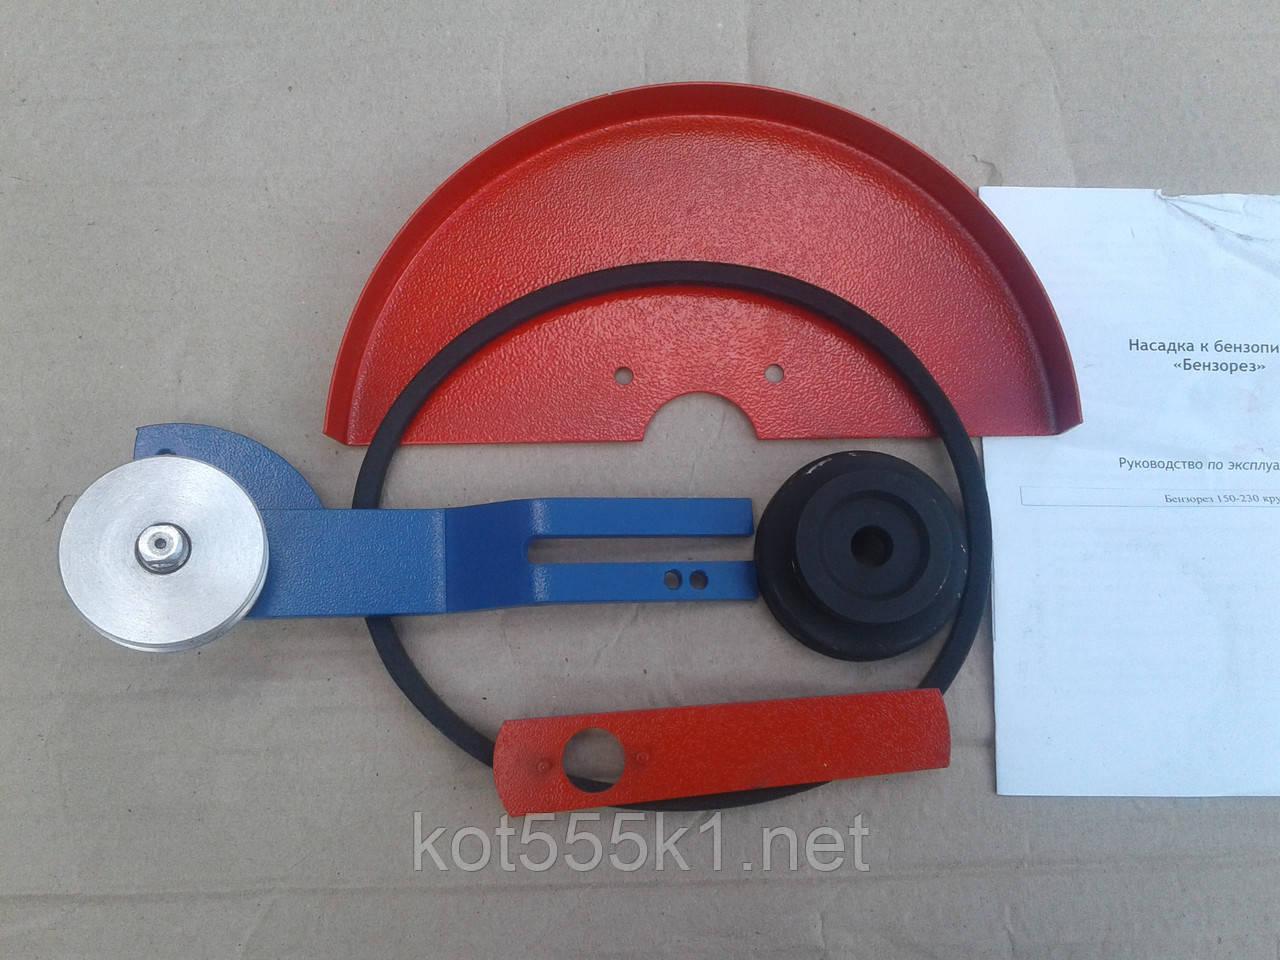 Болгарка насадка на бензопилу STIHL 260/270  Круг 230мм